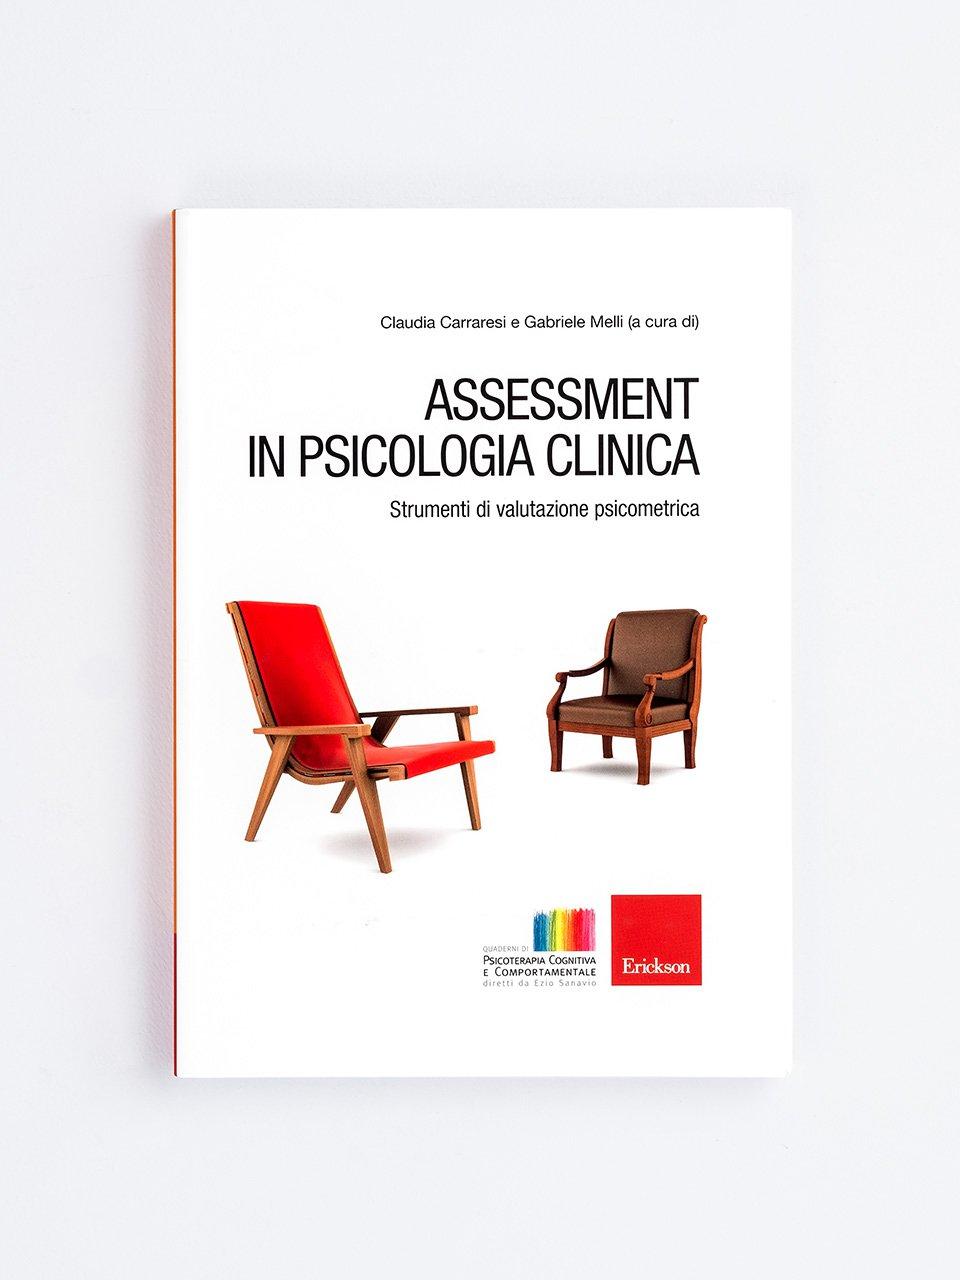 Assessment in psicologia clinica - Affrontare l'ipocondria - Erickson